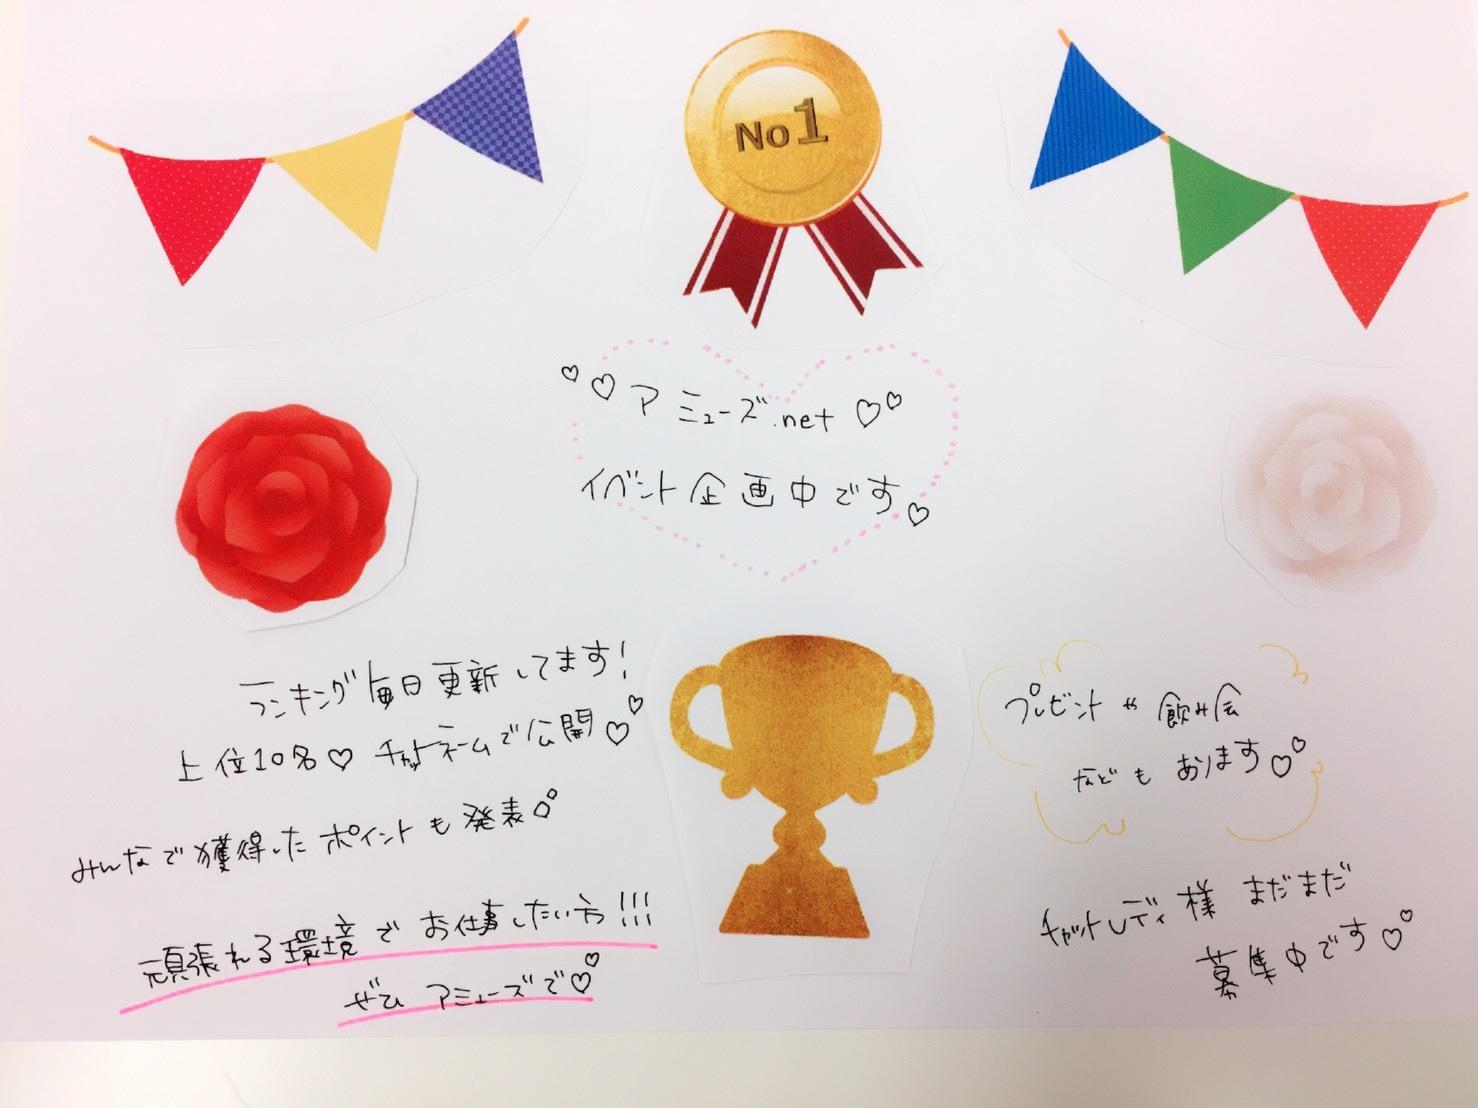 S__7823373.jpg